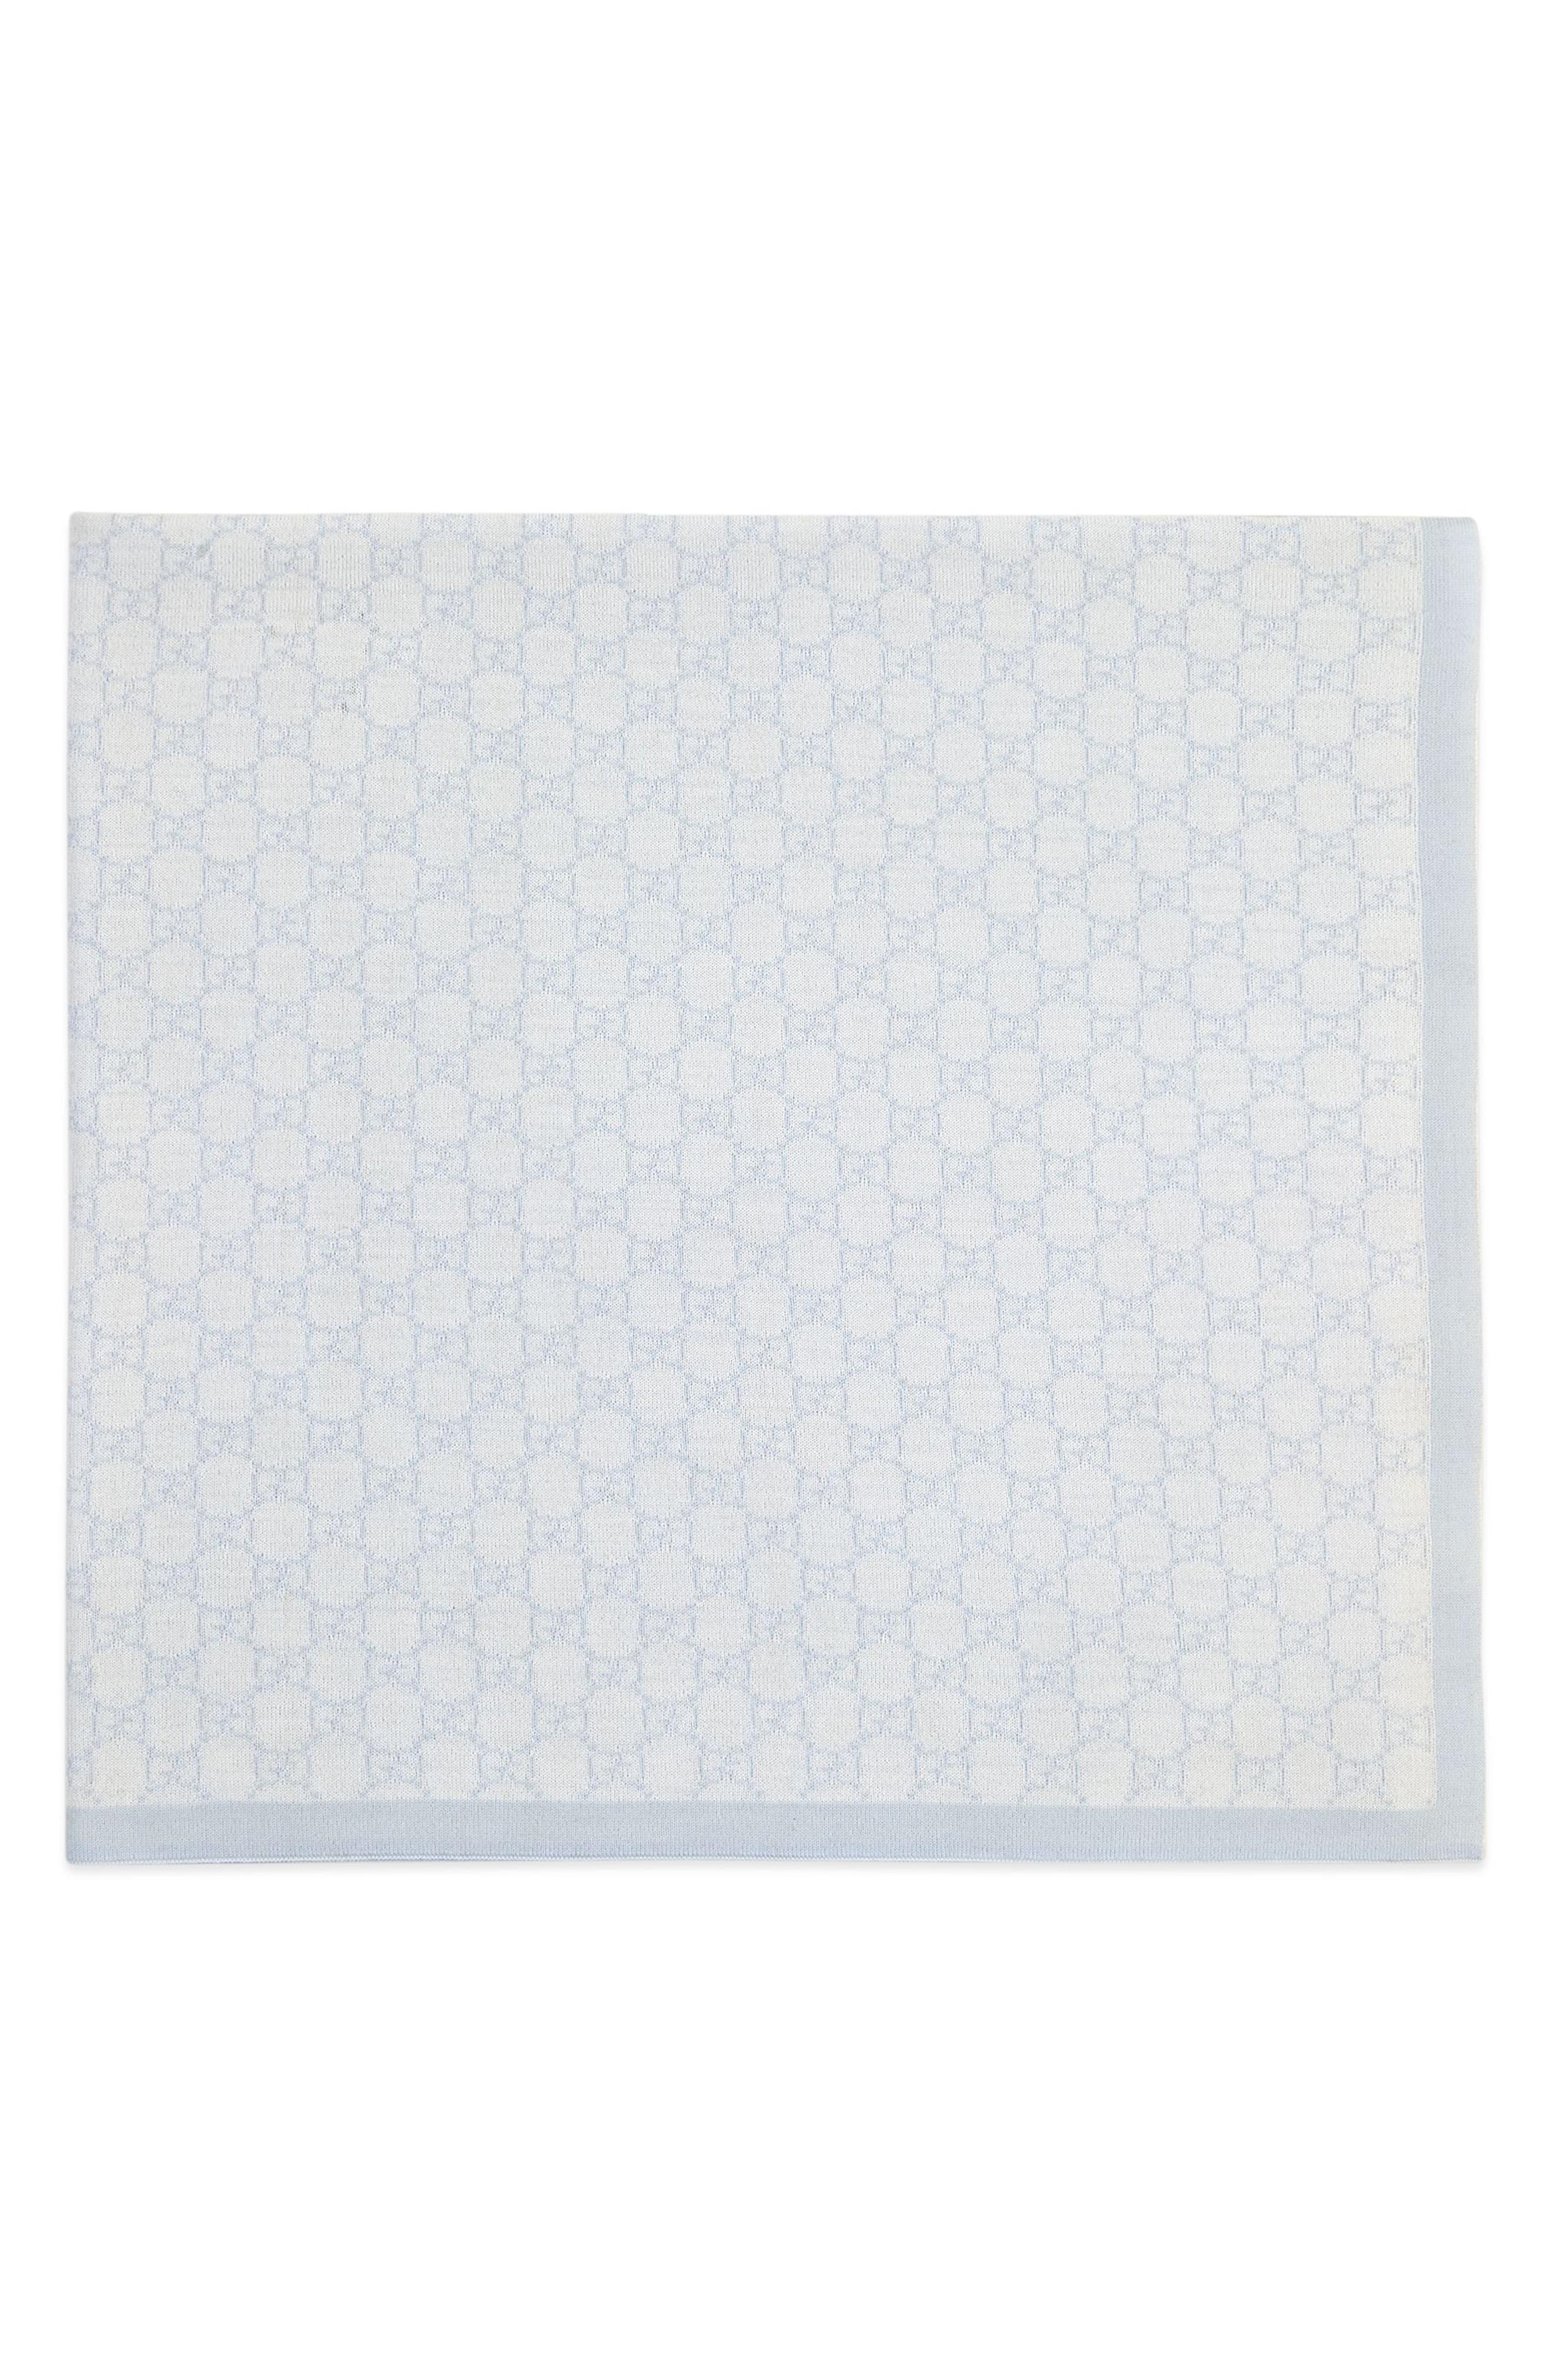 Wool Baby Blanket,                             Alternate thumbnail 4, color,                             IVORY/ SKY BLUE